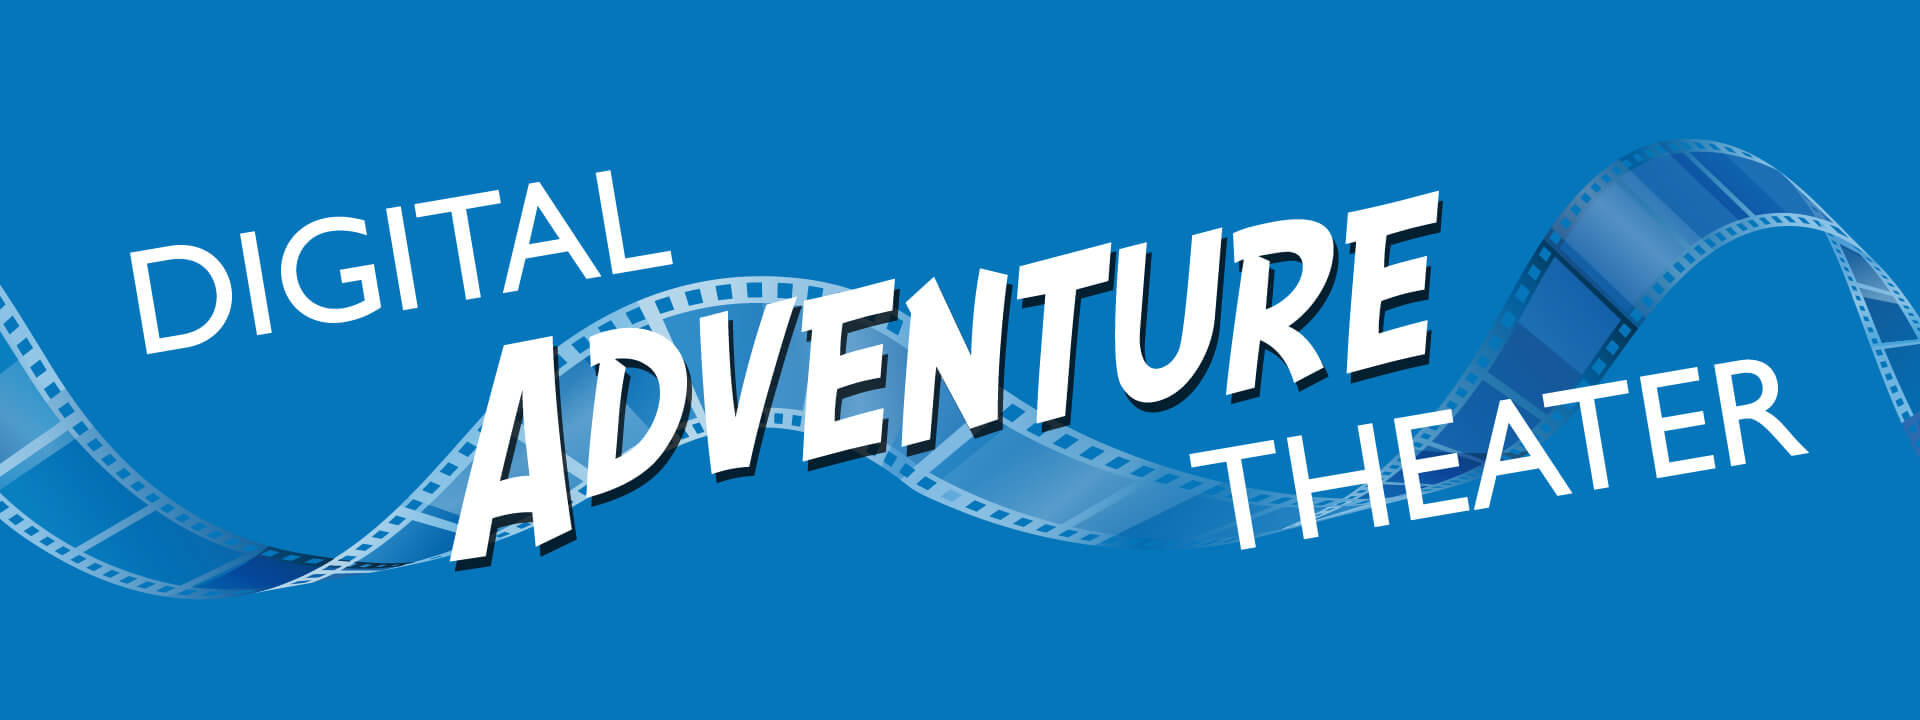 Digital Adventure Theater